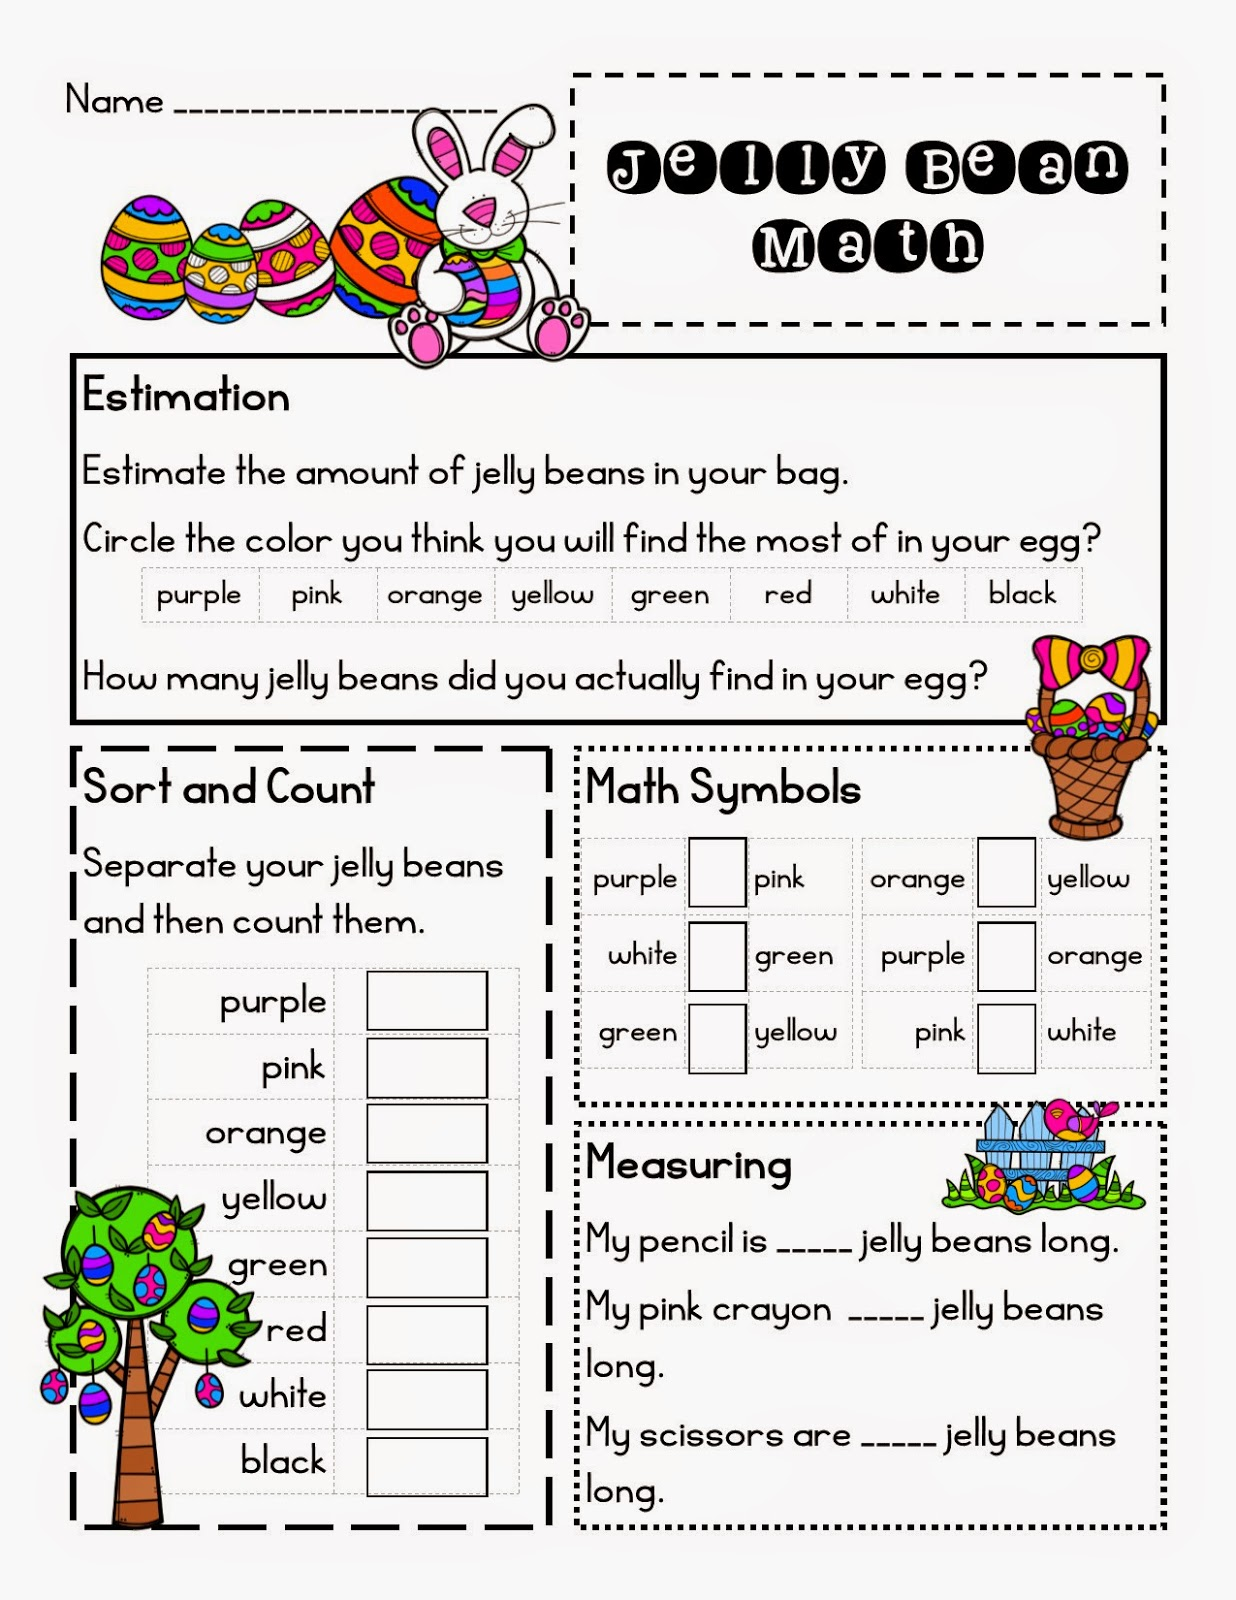 Lory S 2nd Grade Skills Jelly Bean Math